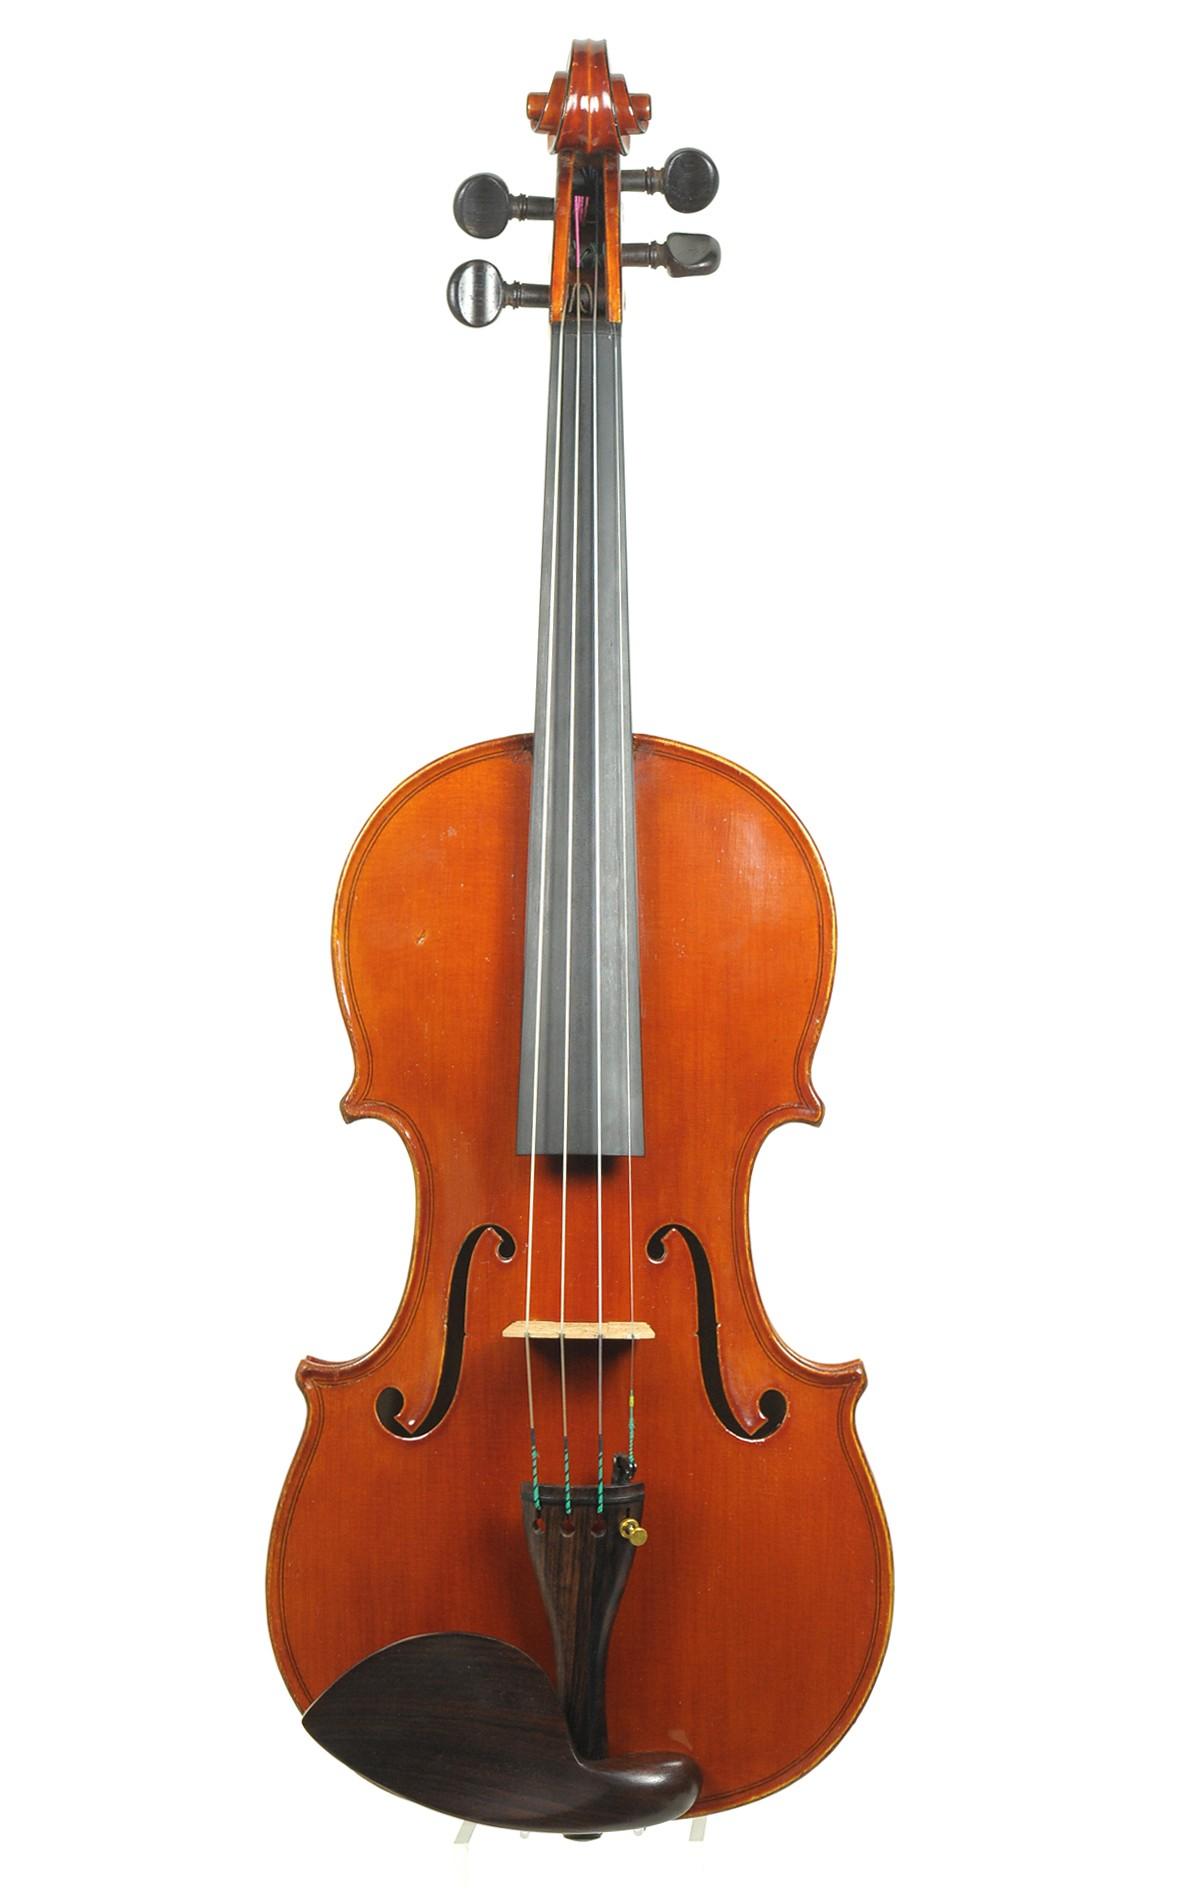 Plinio Michetti, fine Italian violin, Turin, 1931 (certificate by Hieronymus Köstler)